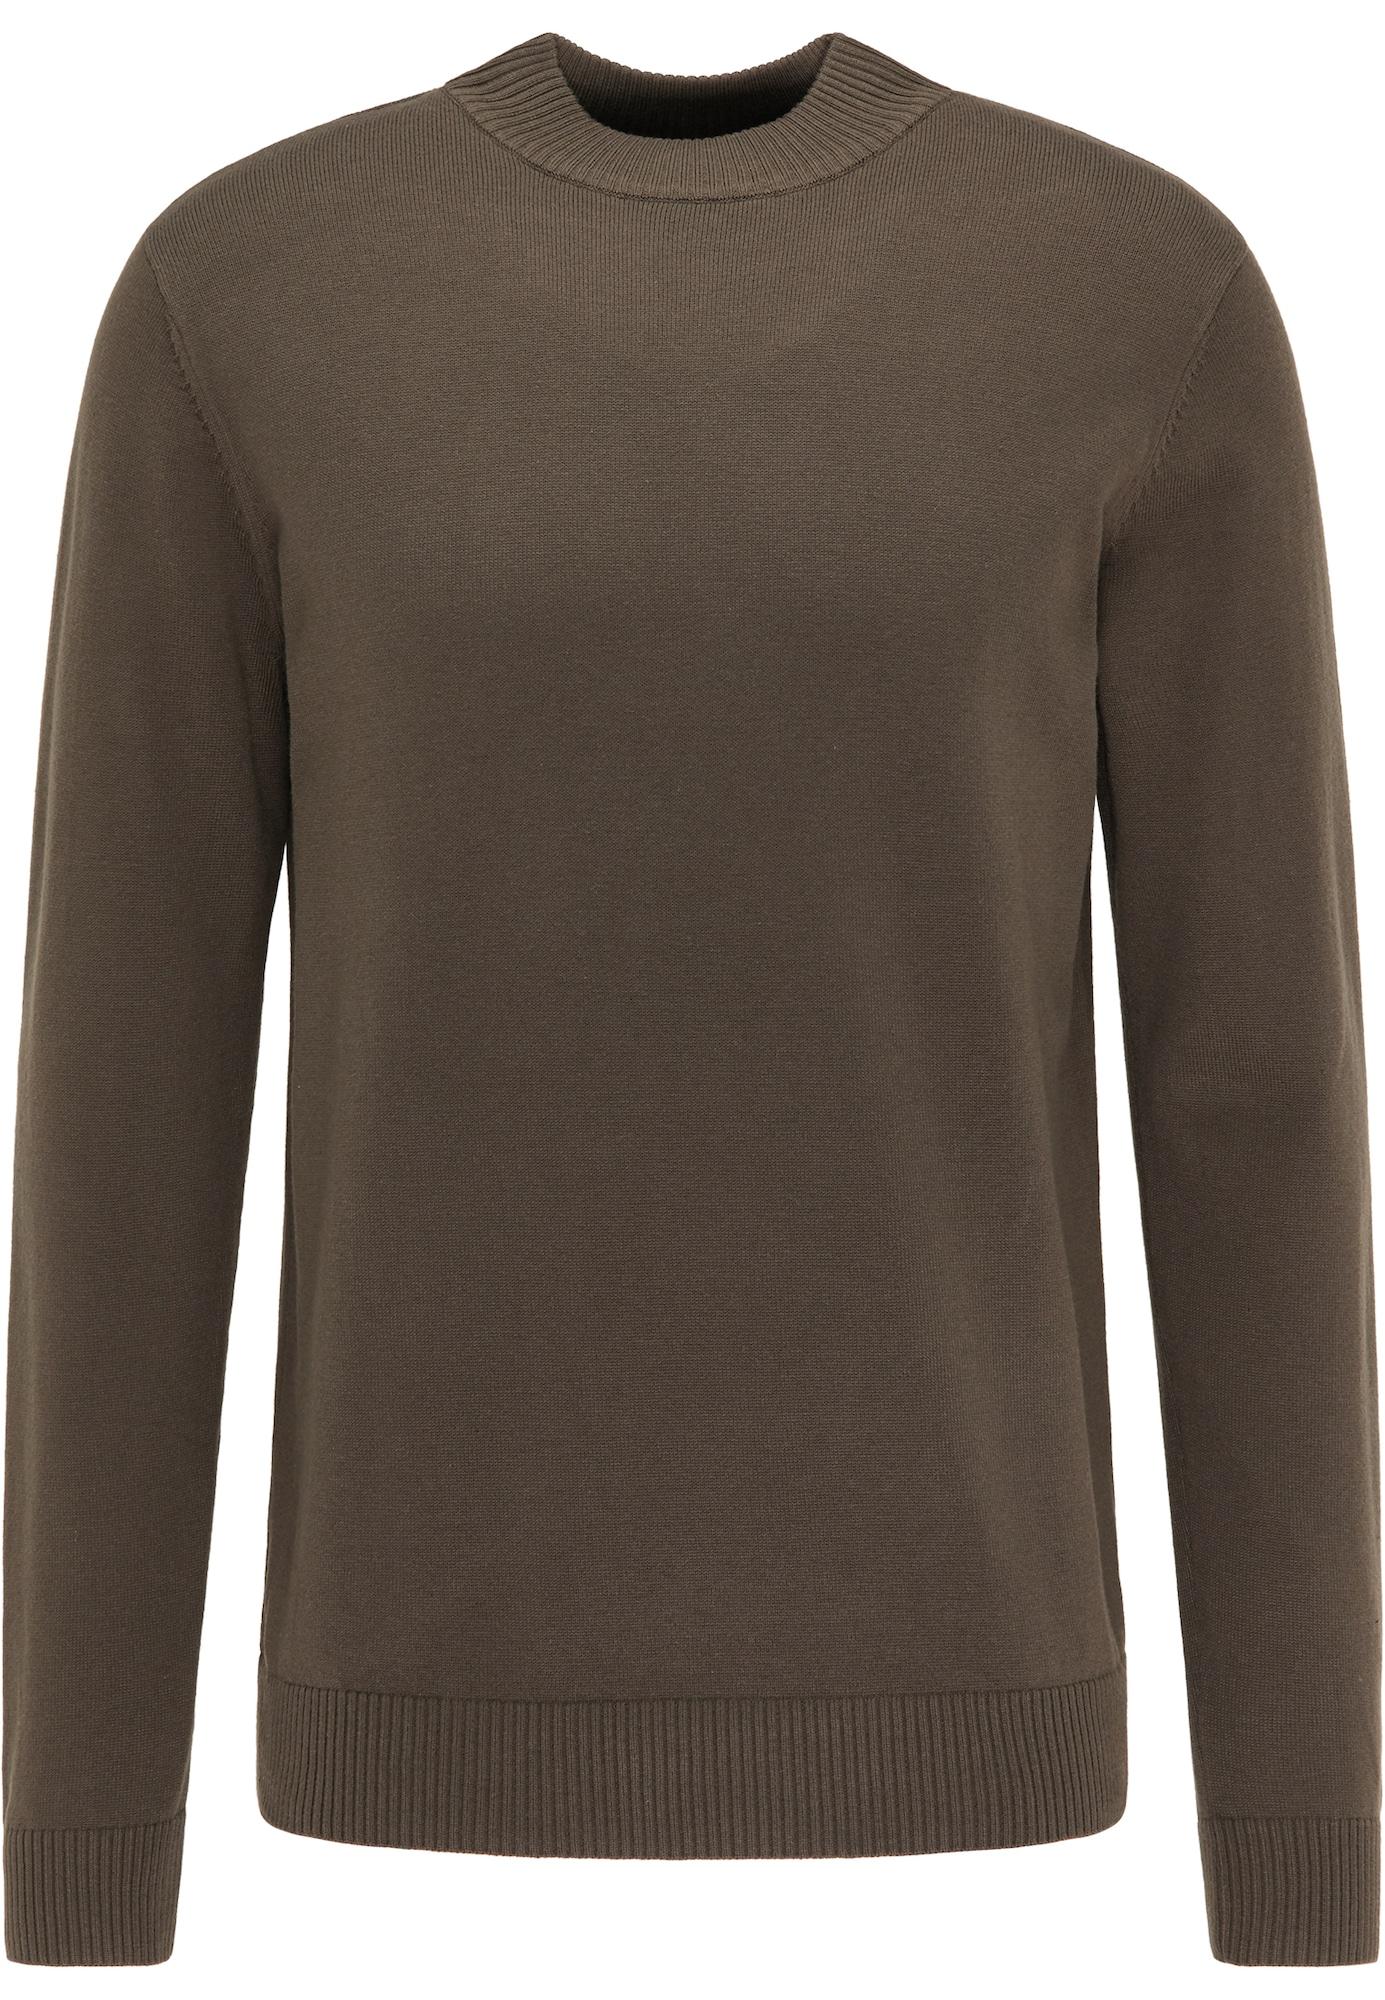 RAIDO Megztinis brokato spalva